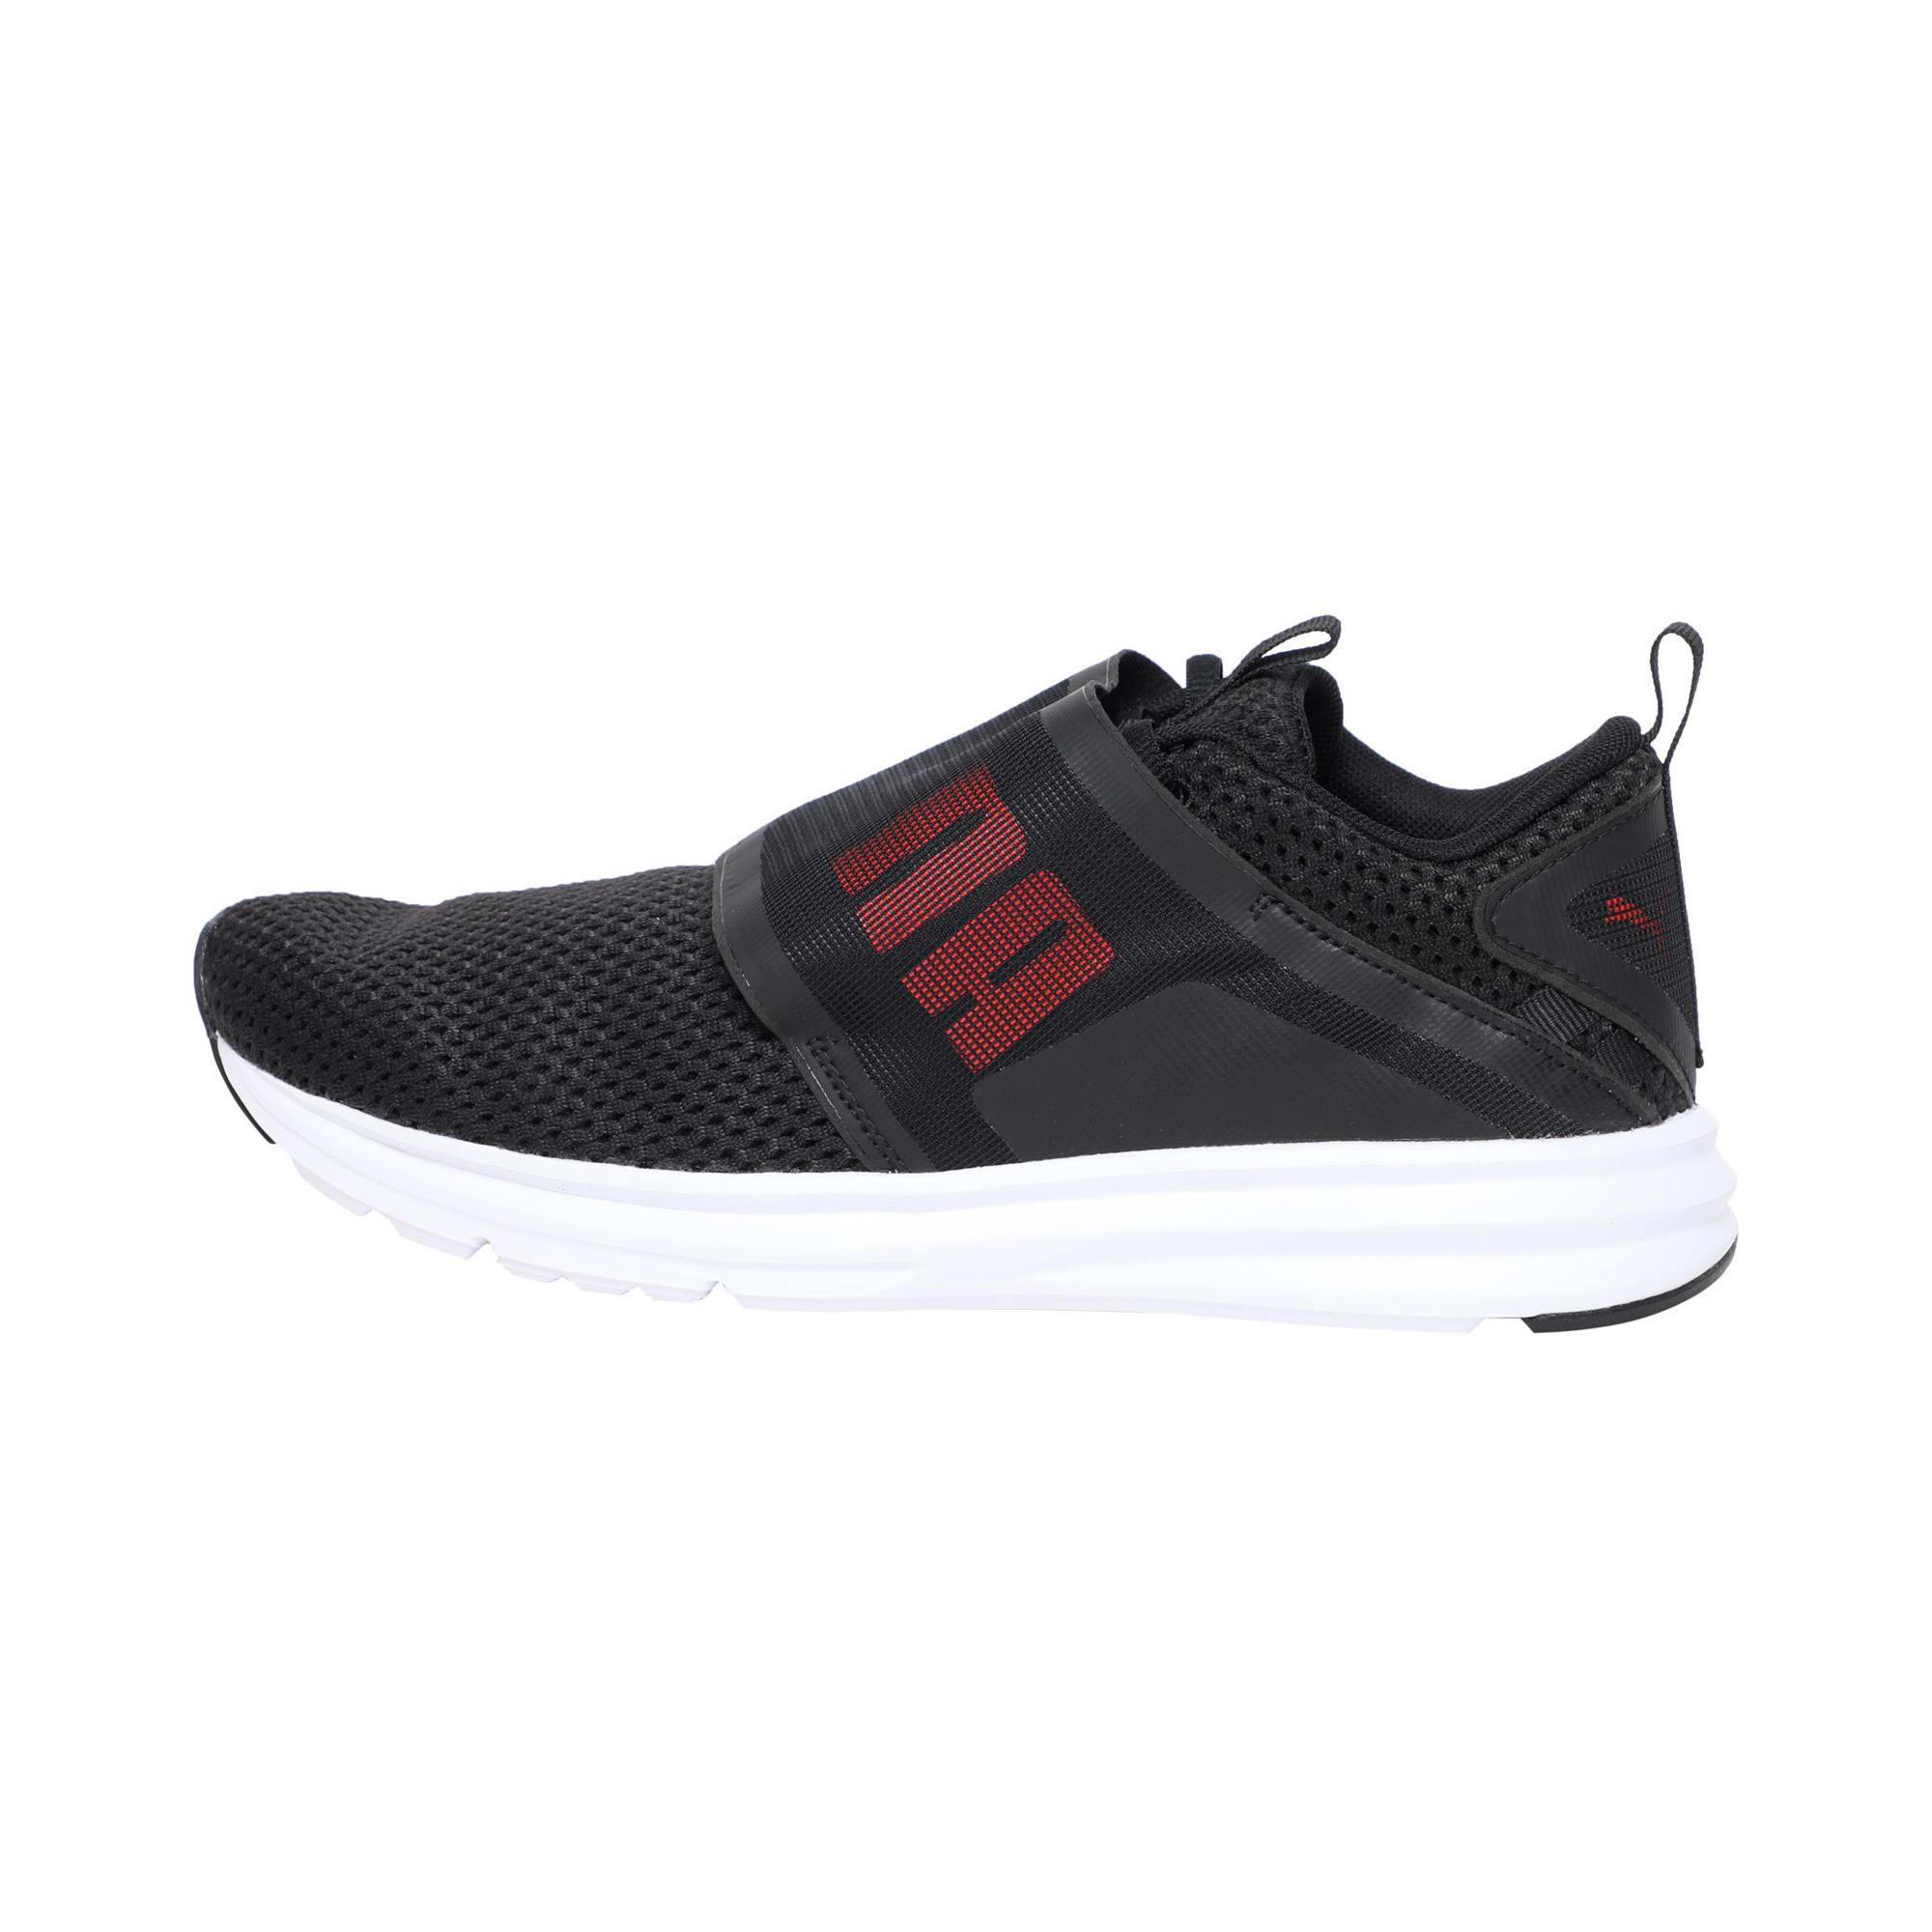 Thumbnail 1 of Enzo Strap Mesh Men's Running Shoes, Puma Black-Flame Scarlet, medium-IND